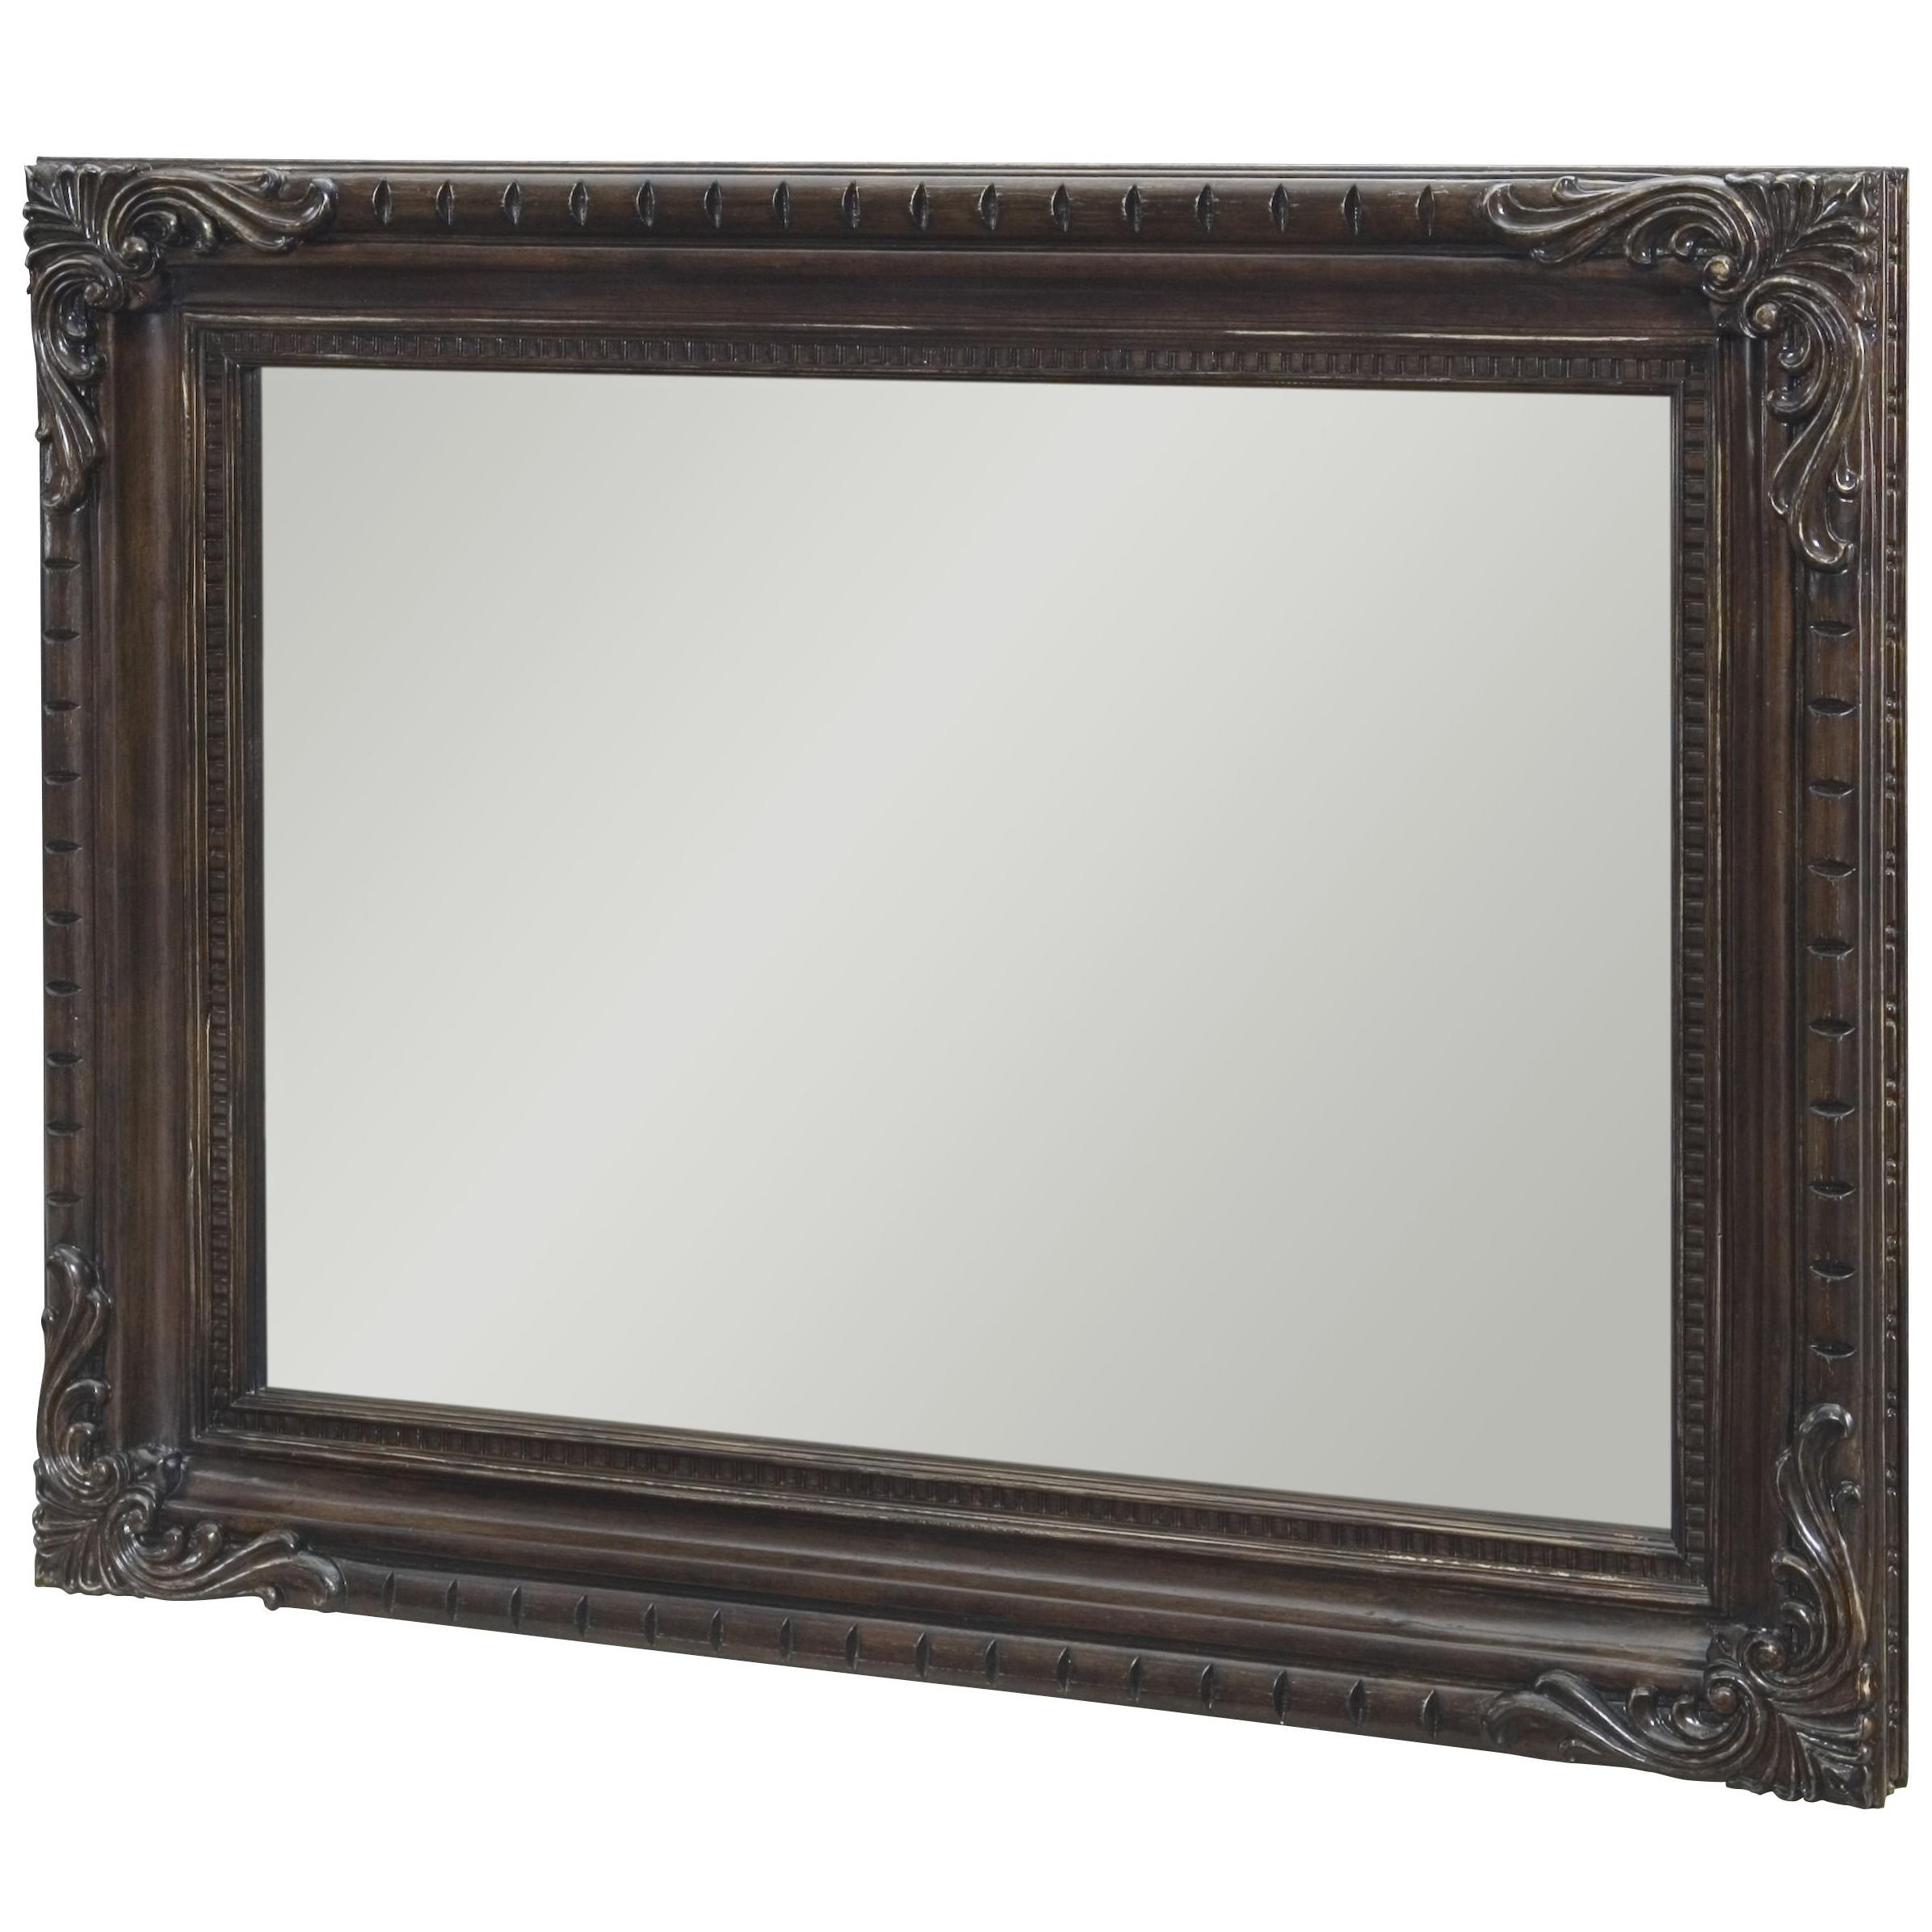 Legacy Classic La Bella Vita Landscape Mirror - Item Number: 4200-0100